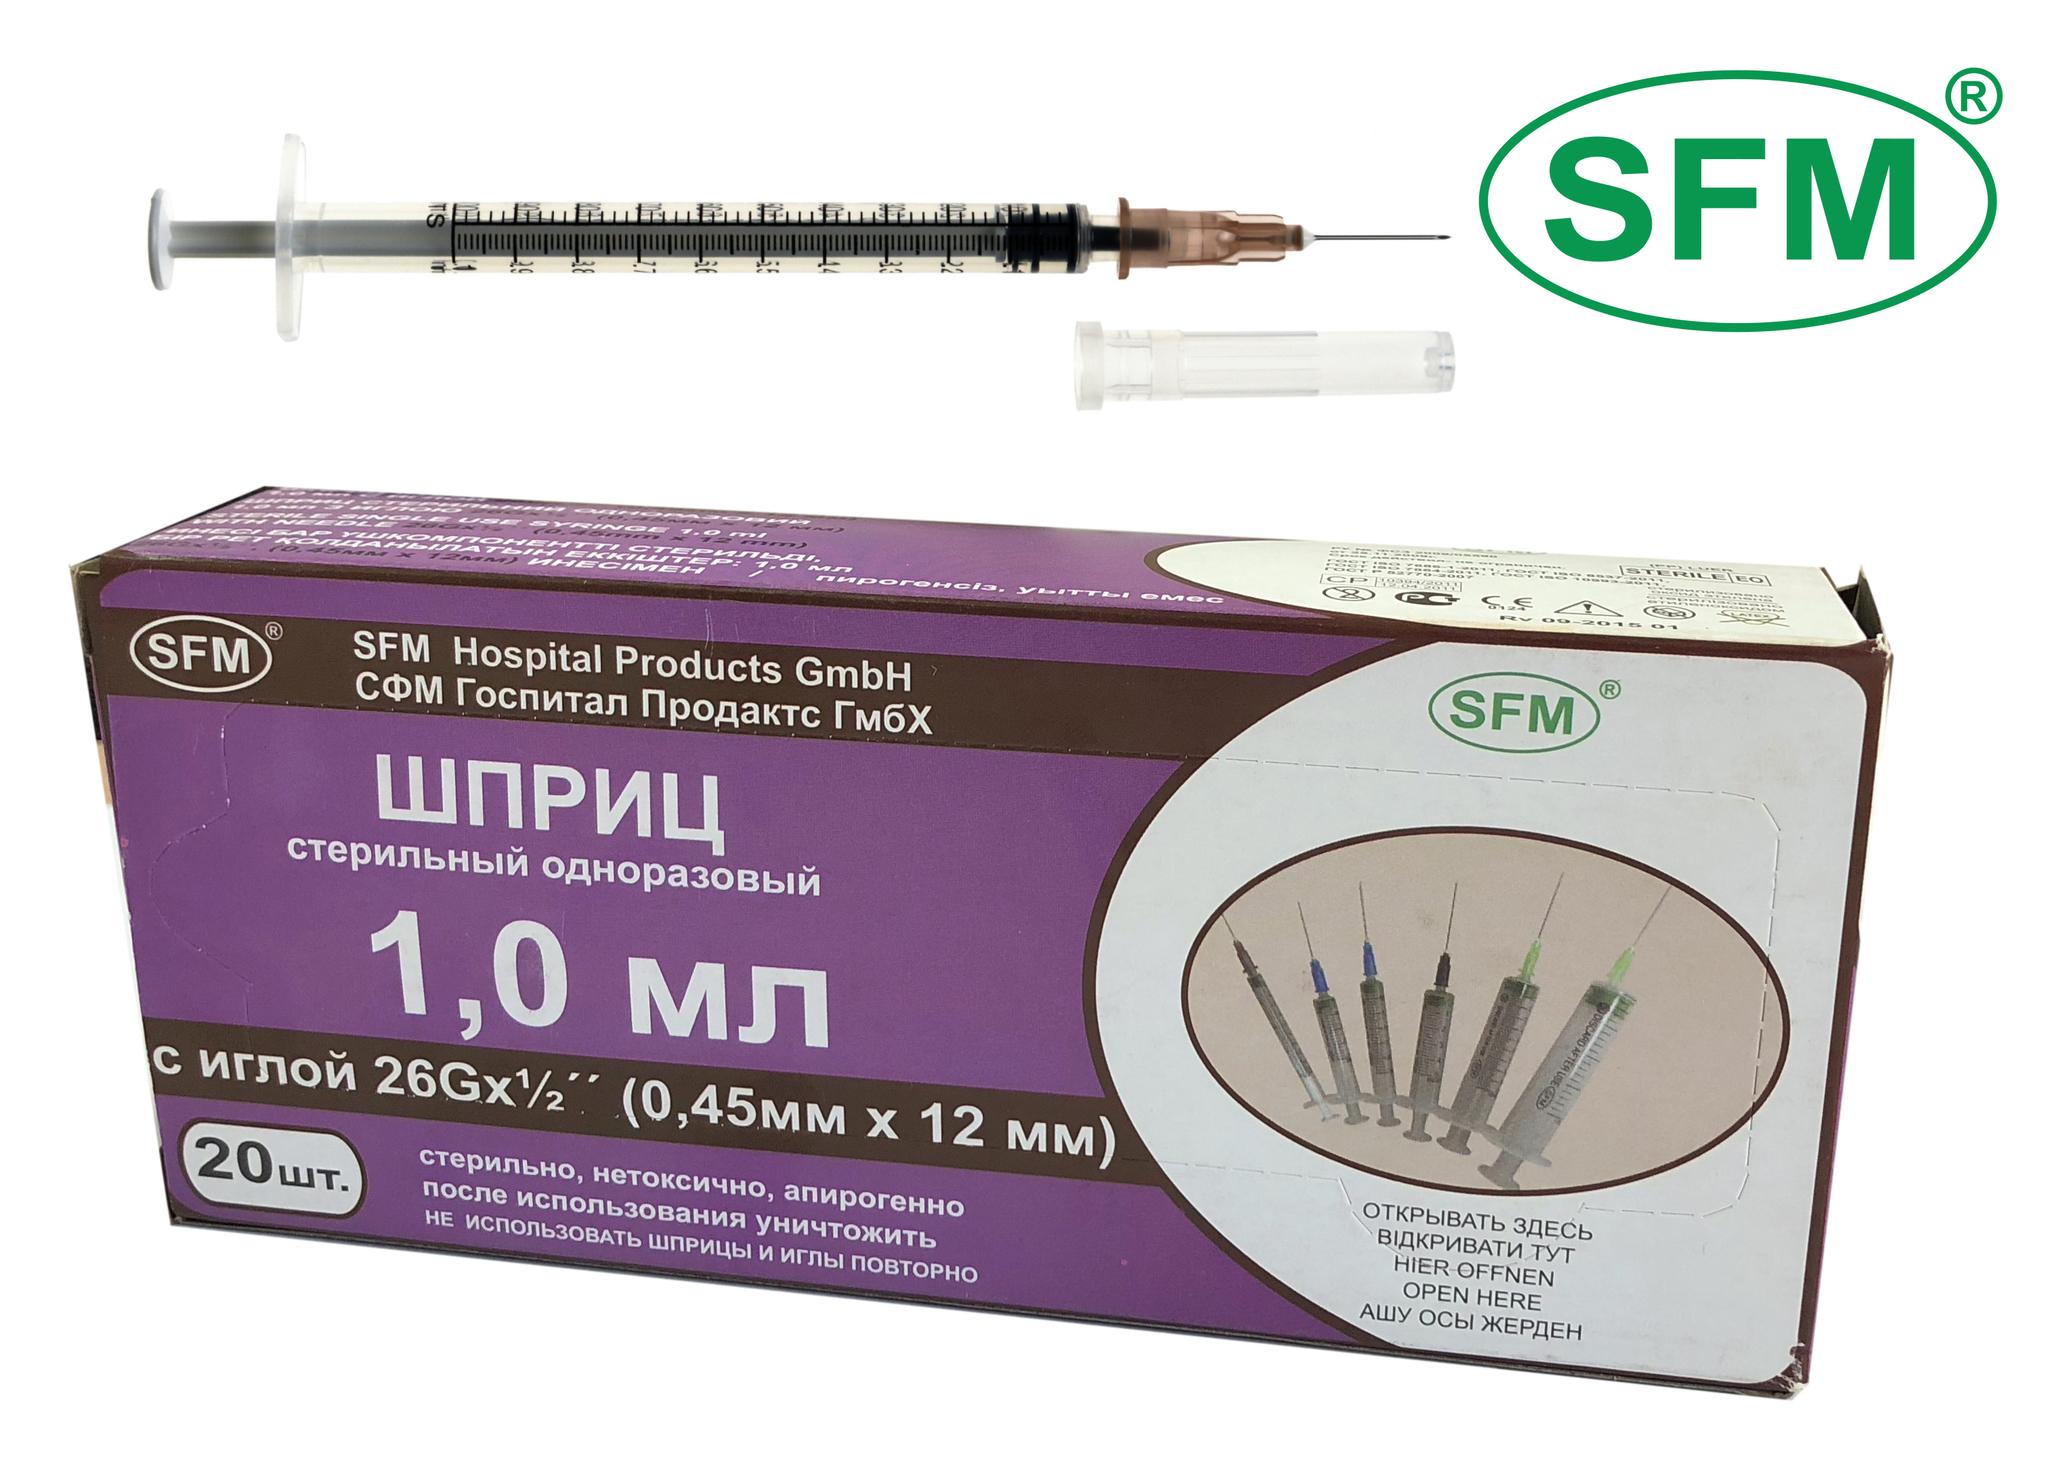 Купить Шприц 1 мл со шкалой 1 мл для туберкулина с надетой иглой 0, 45х12 (26G) - 20 штук, SFM Hospital Products